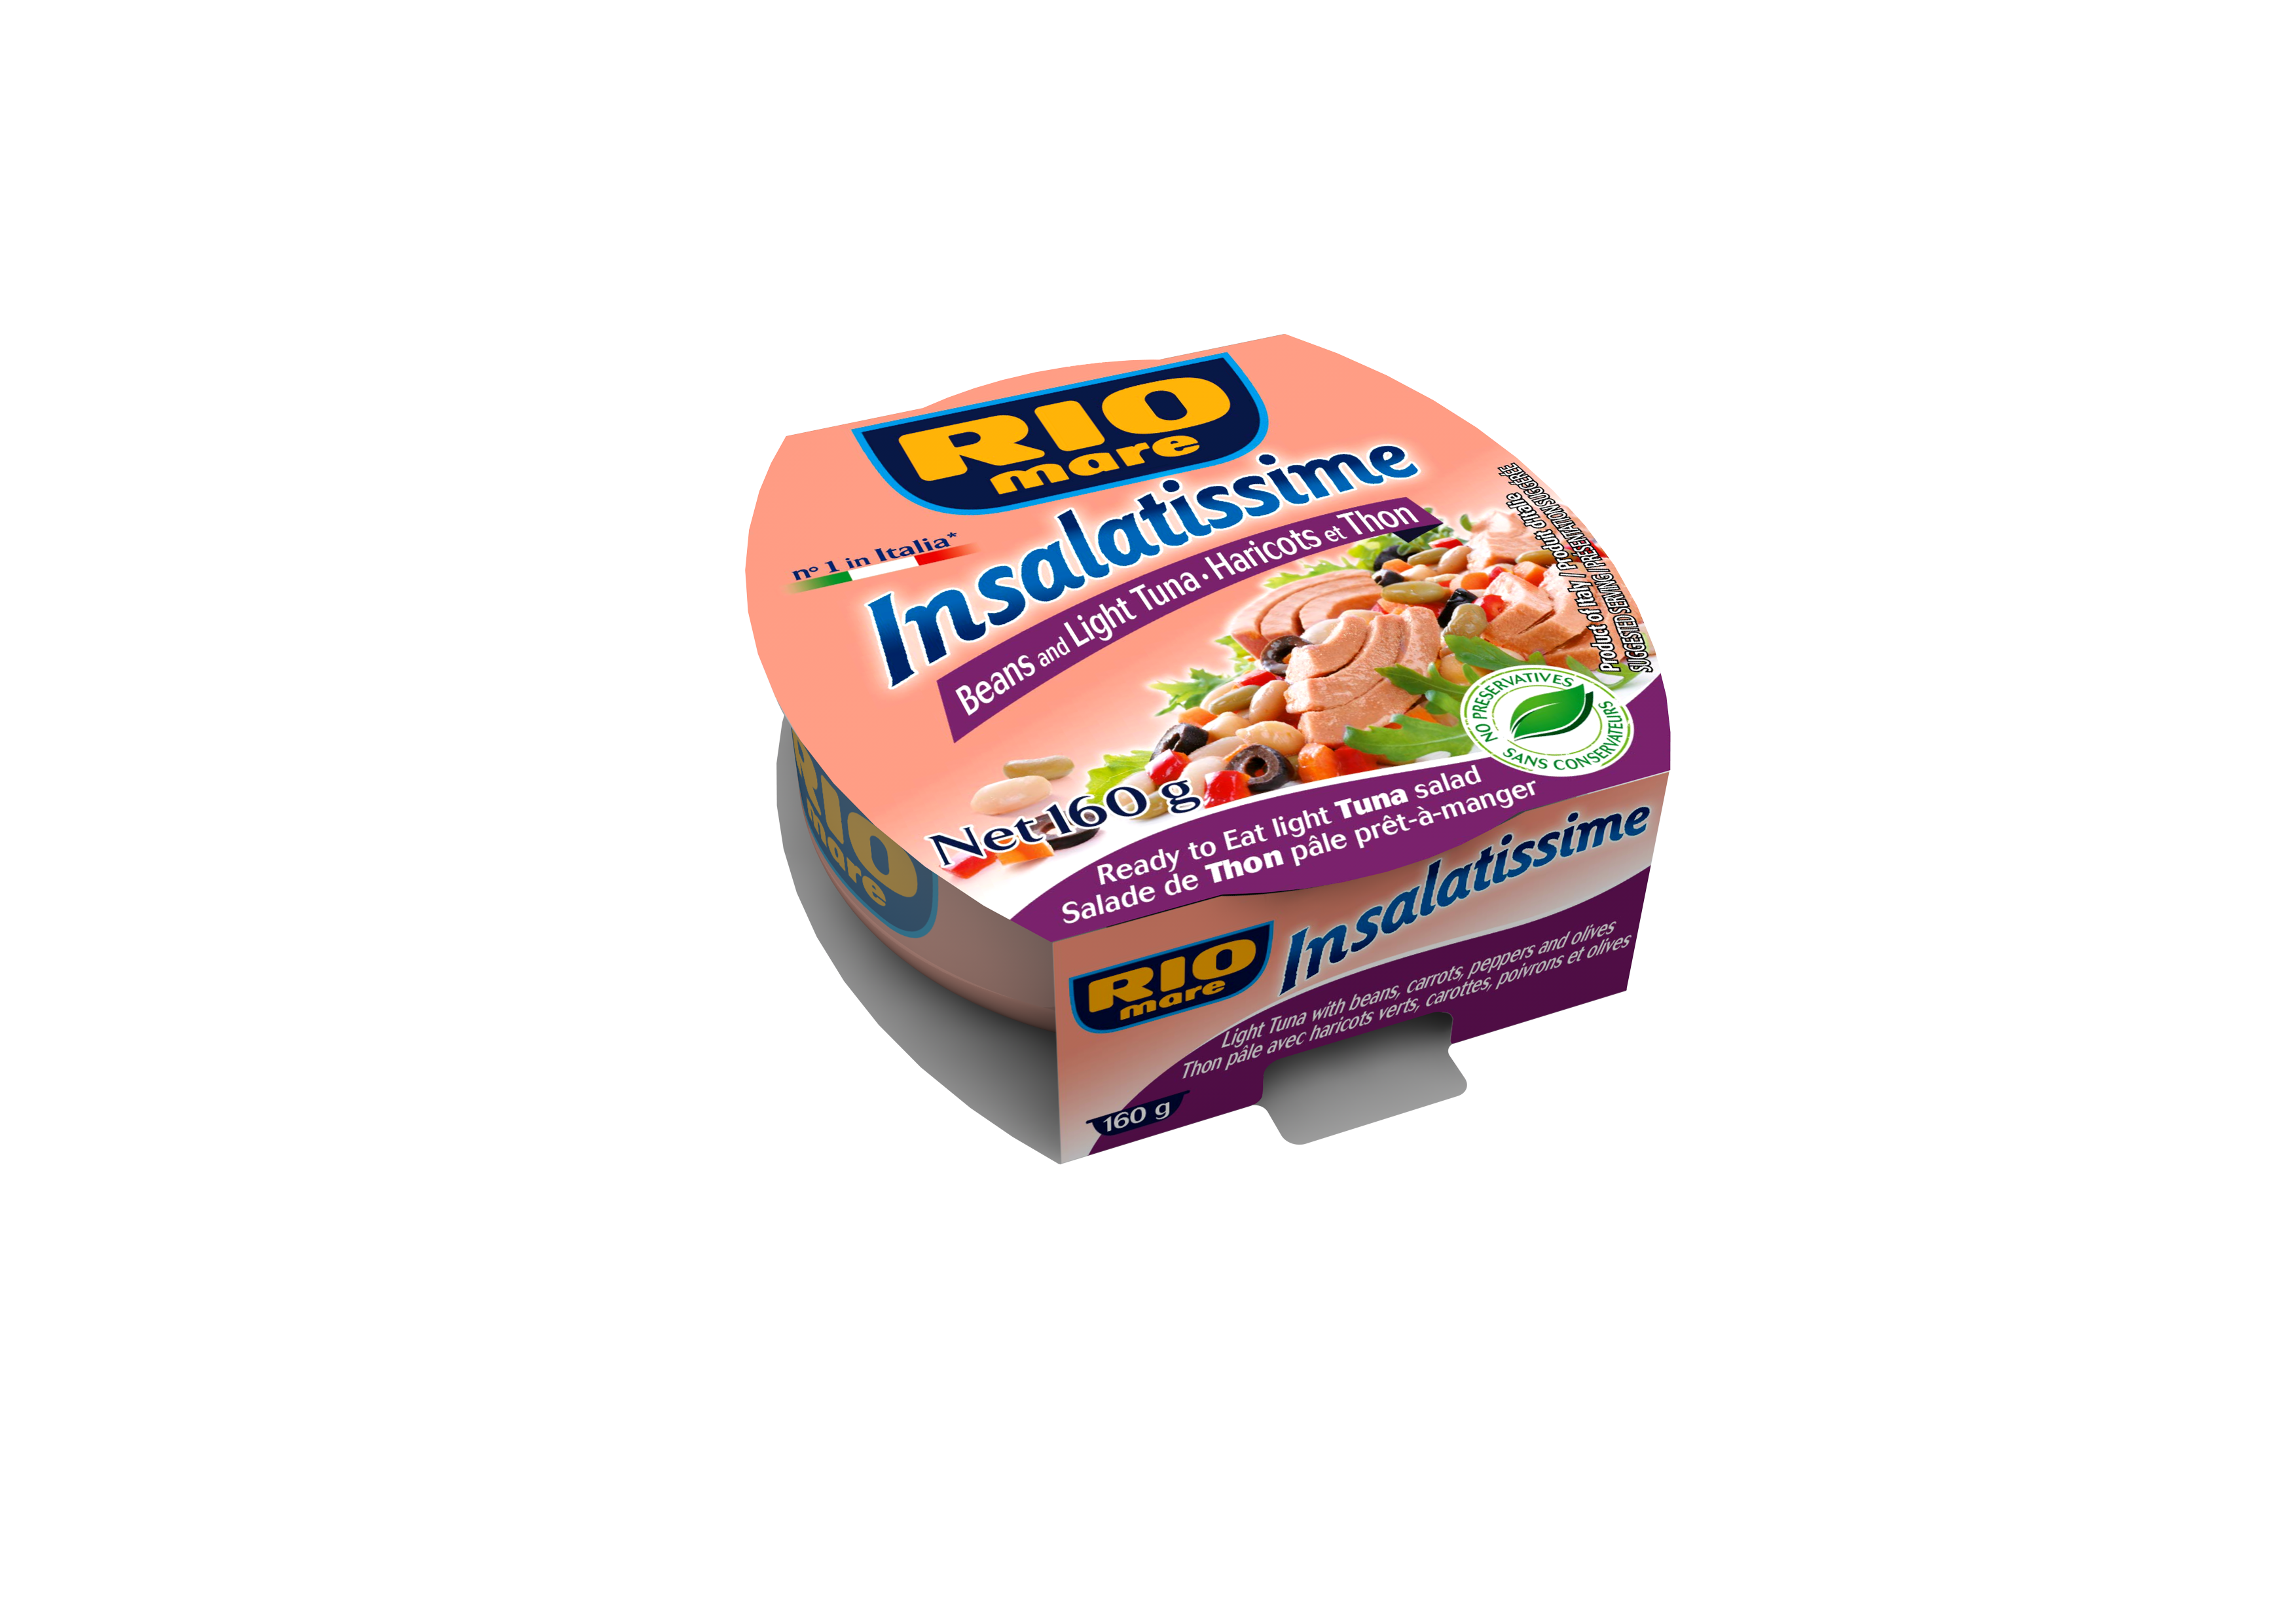 Insalatissime rice and light tuna salad